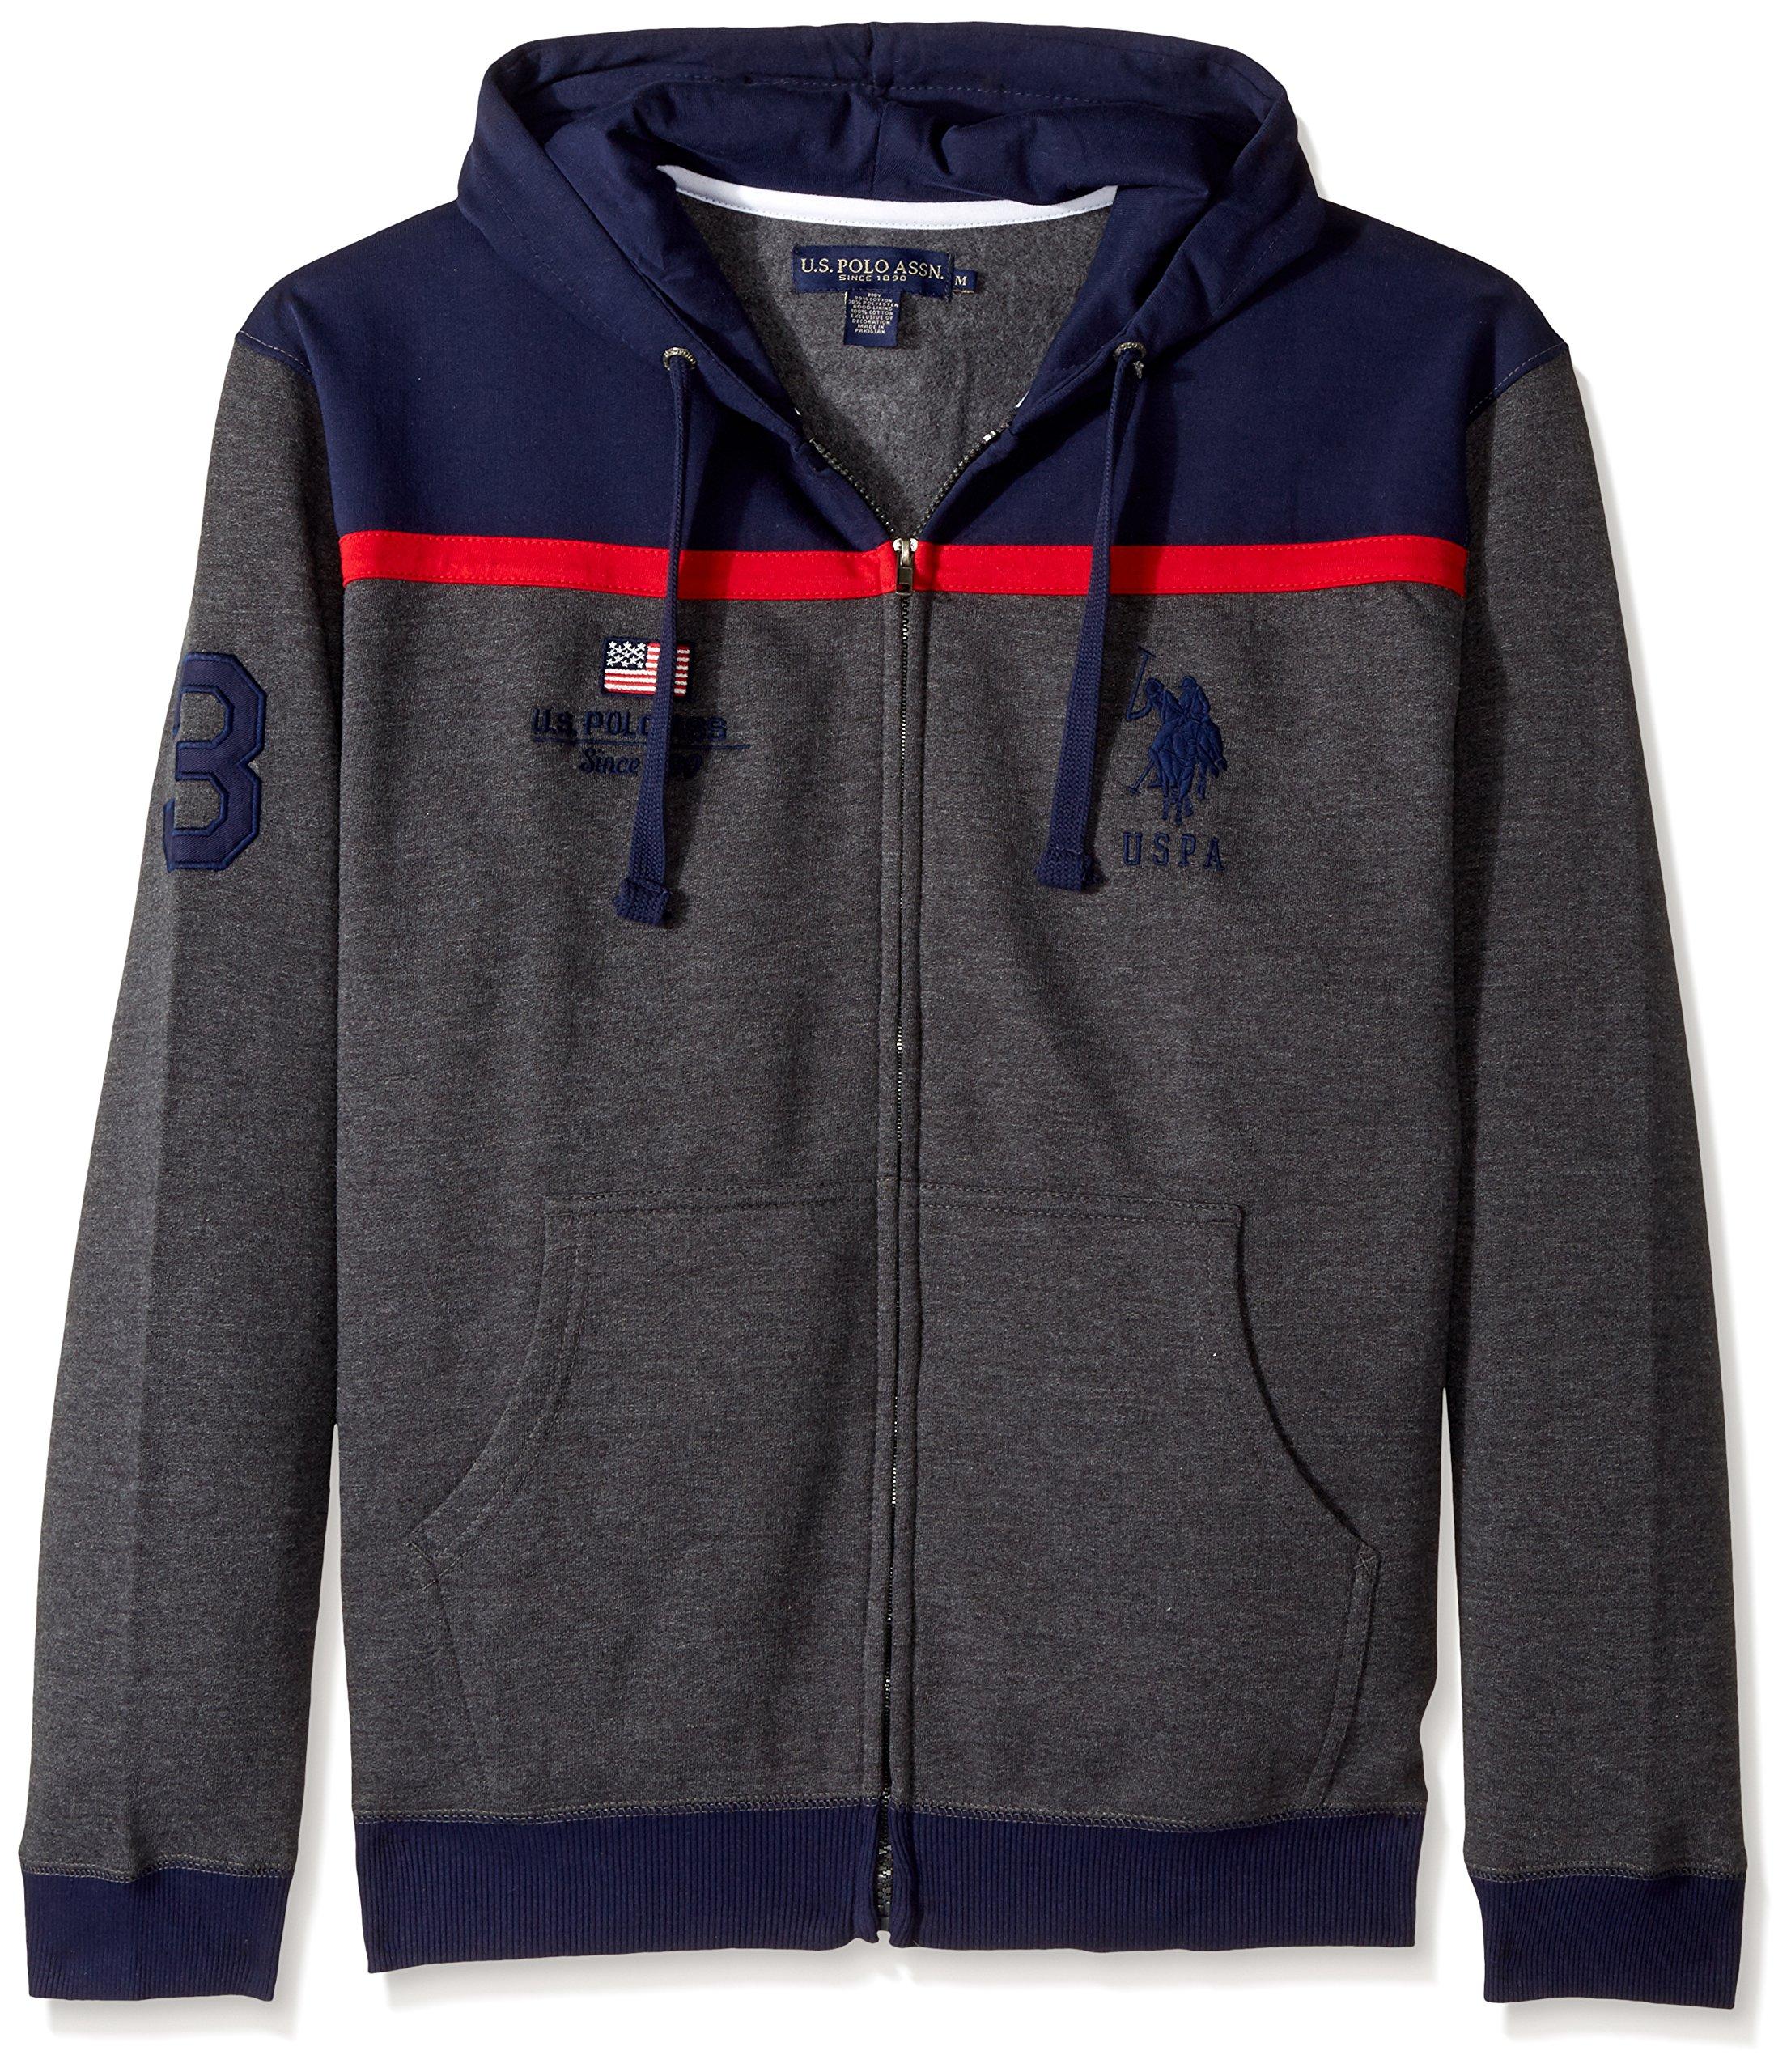 U.S. Polo Assn. Men's Color Block Fleece Hooded Jacket, 3339-Dark Heather Grey, L